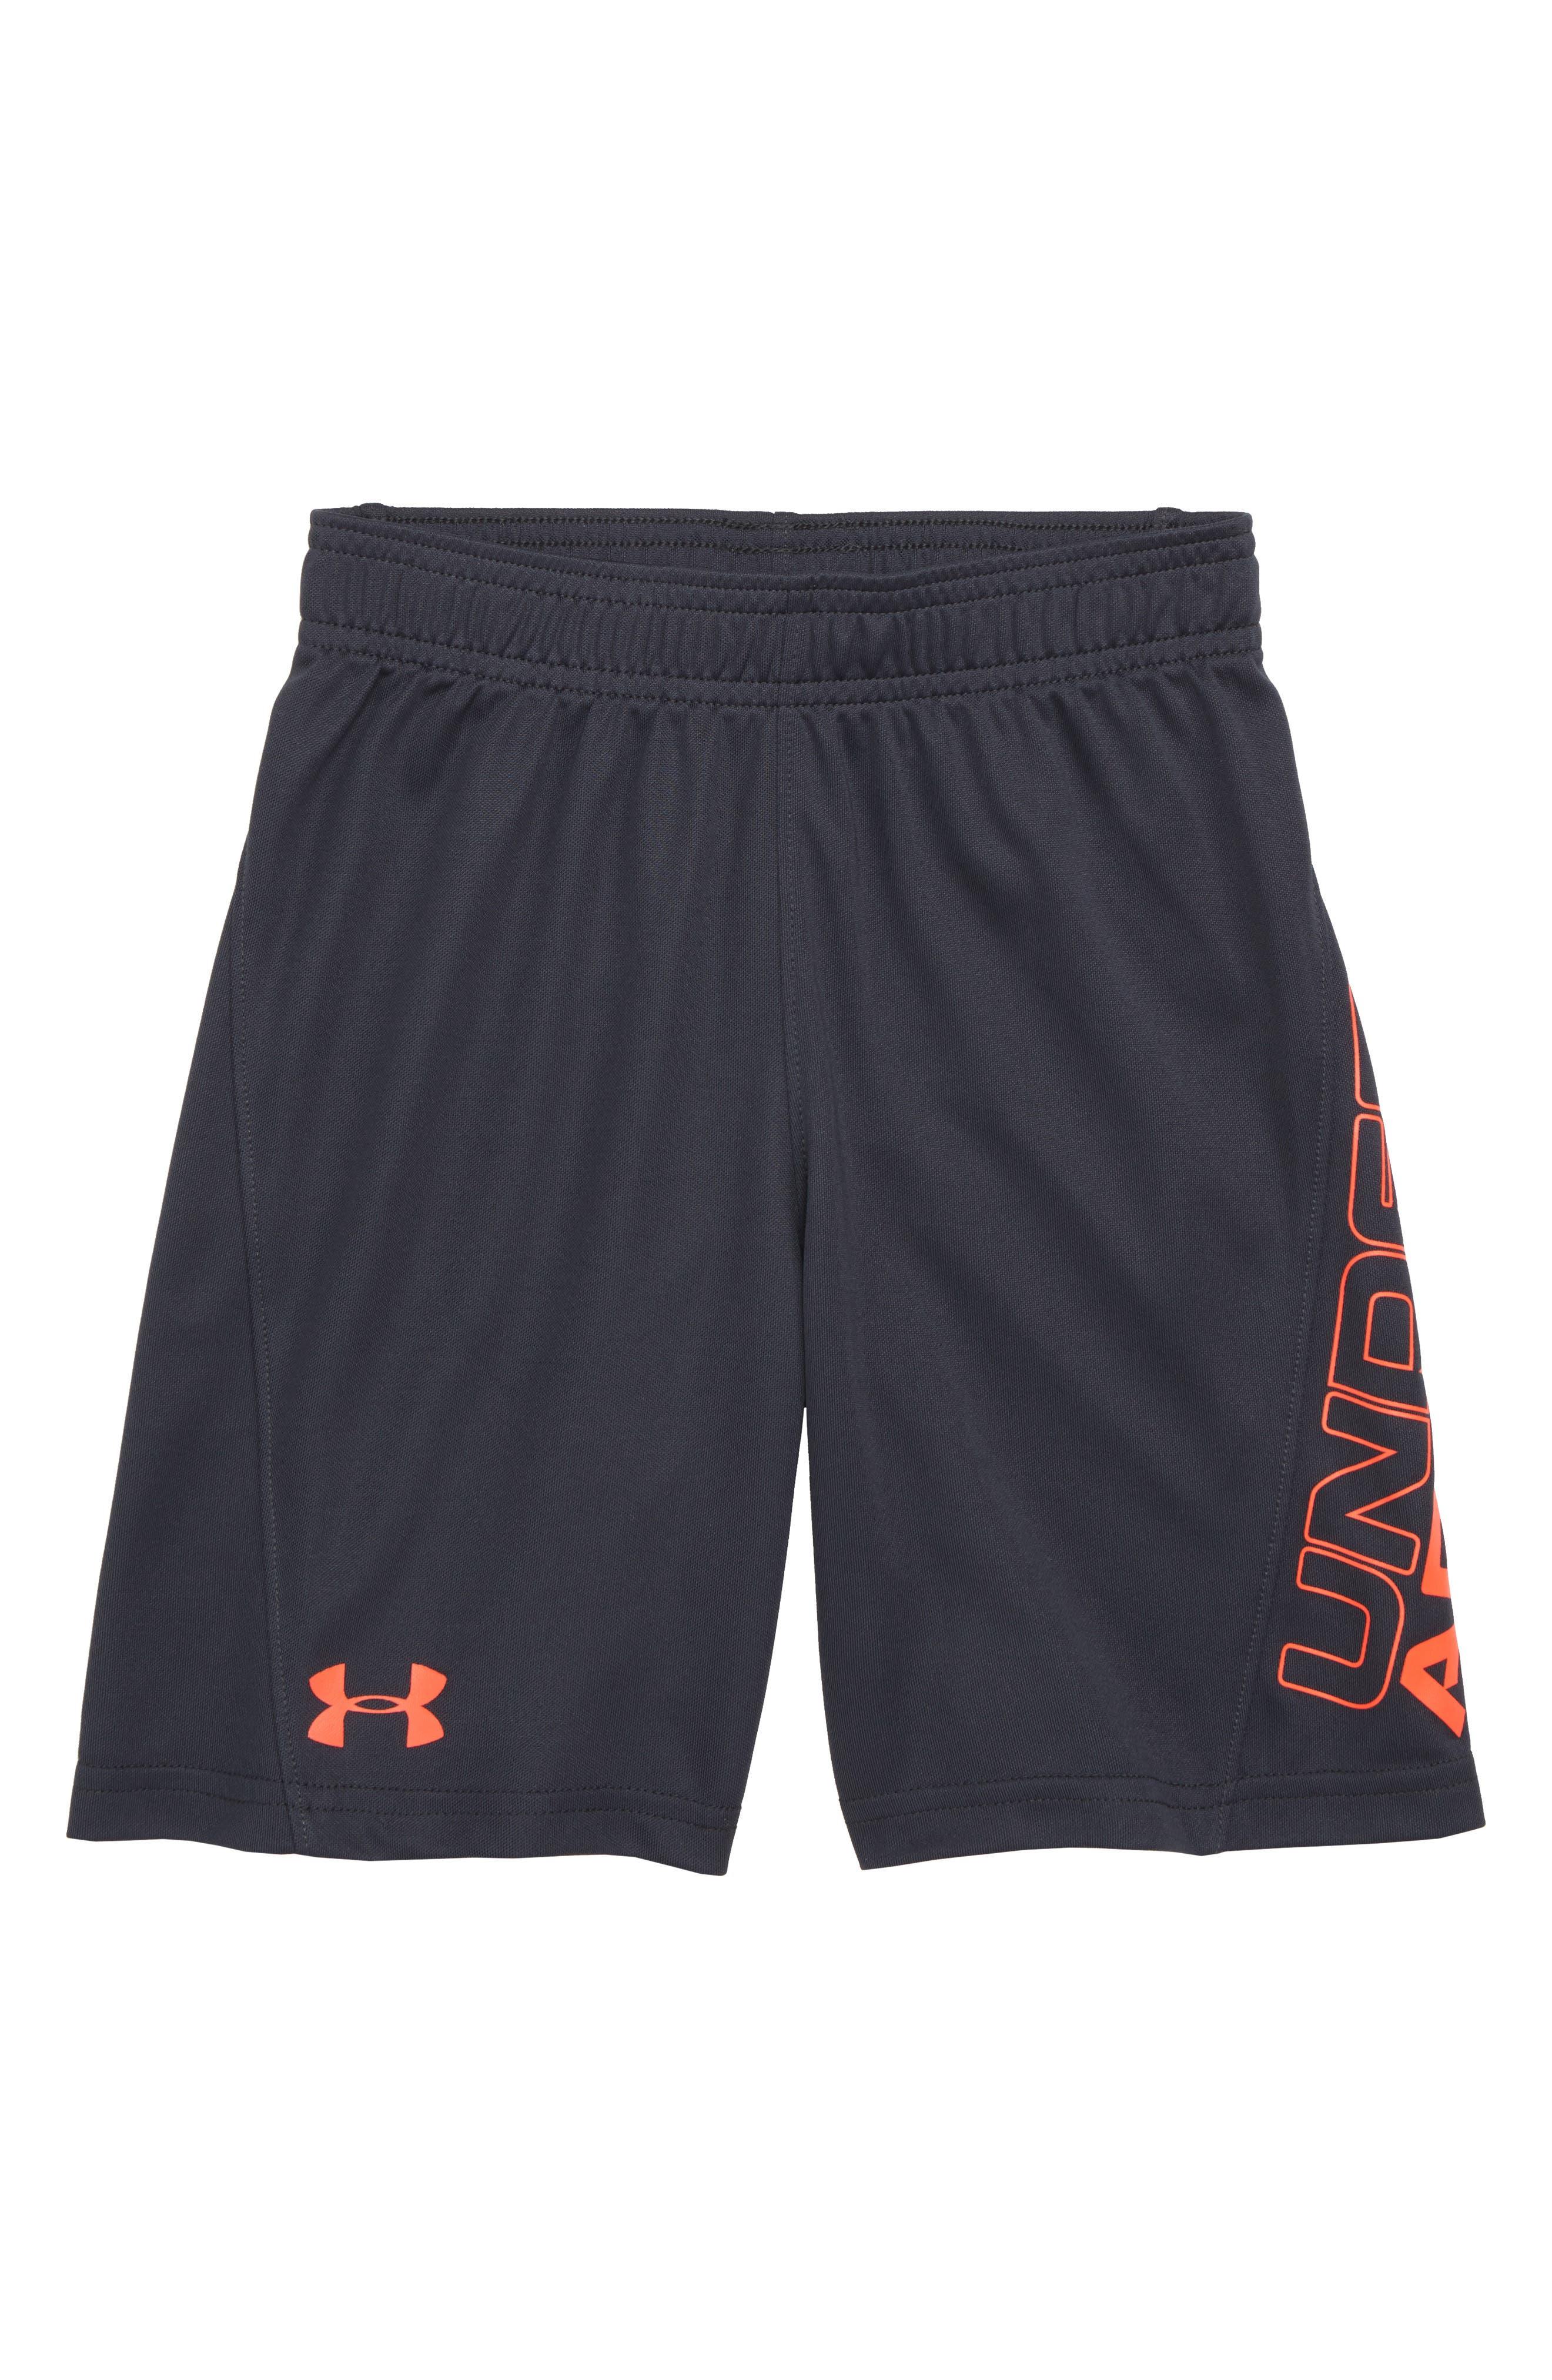 Kick Off HeatGear<sup>®</sup> Shorts,                         Main,                         color, Anthracite